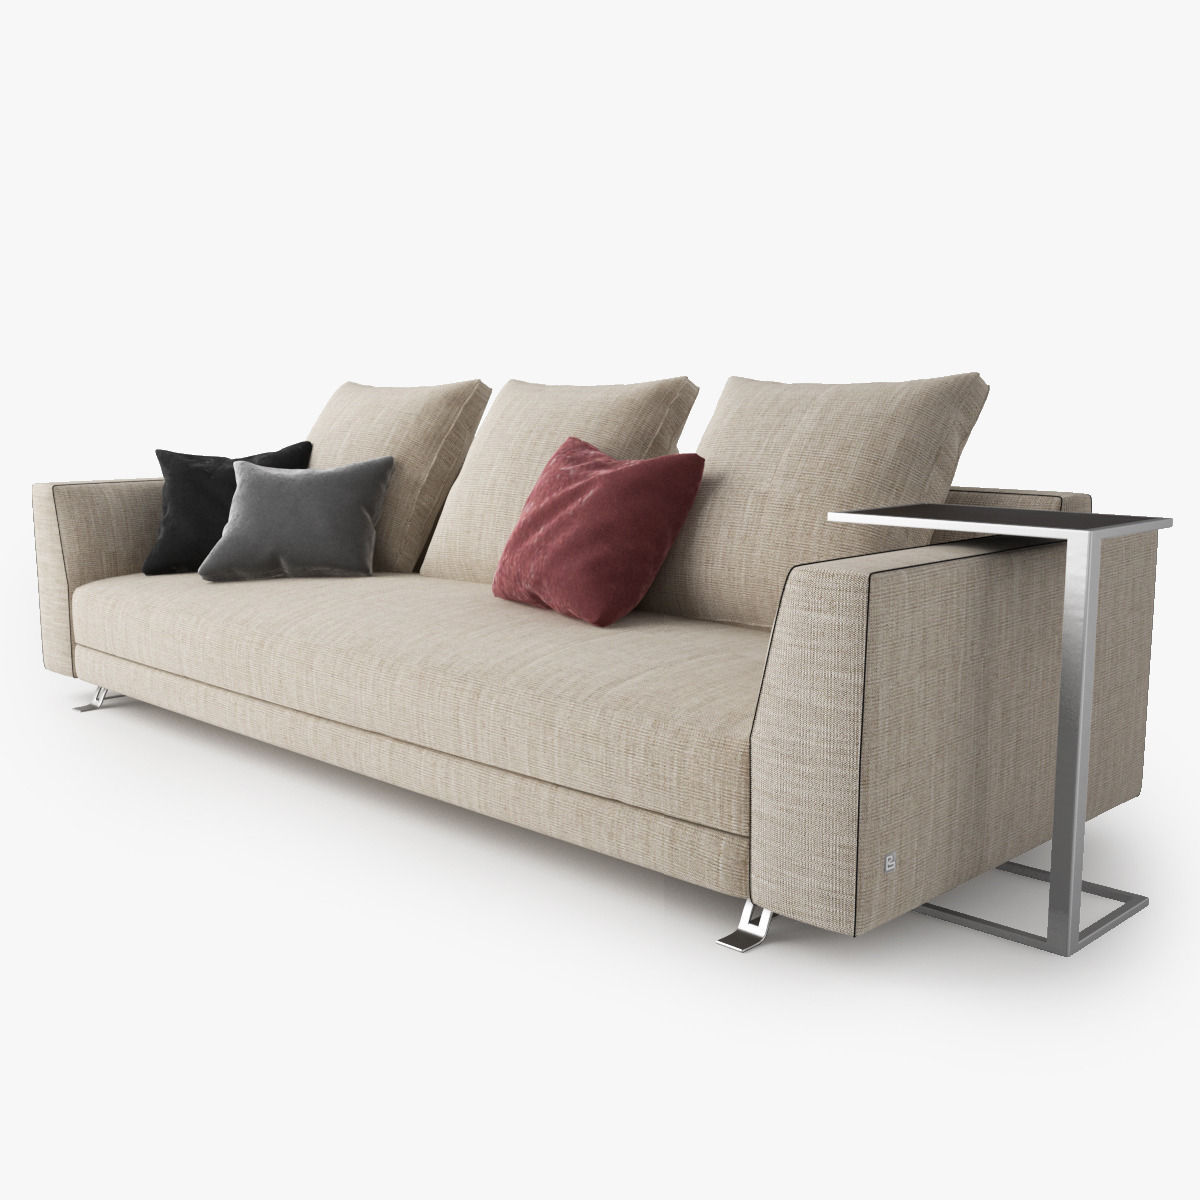 Busnelli Burton Sofa 3d Model Max Obj Fbx Cgtrader Com